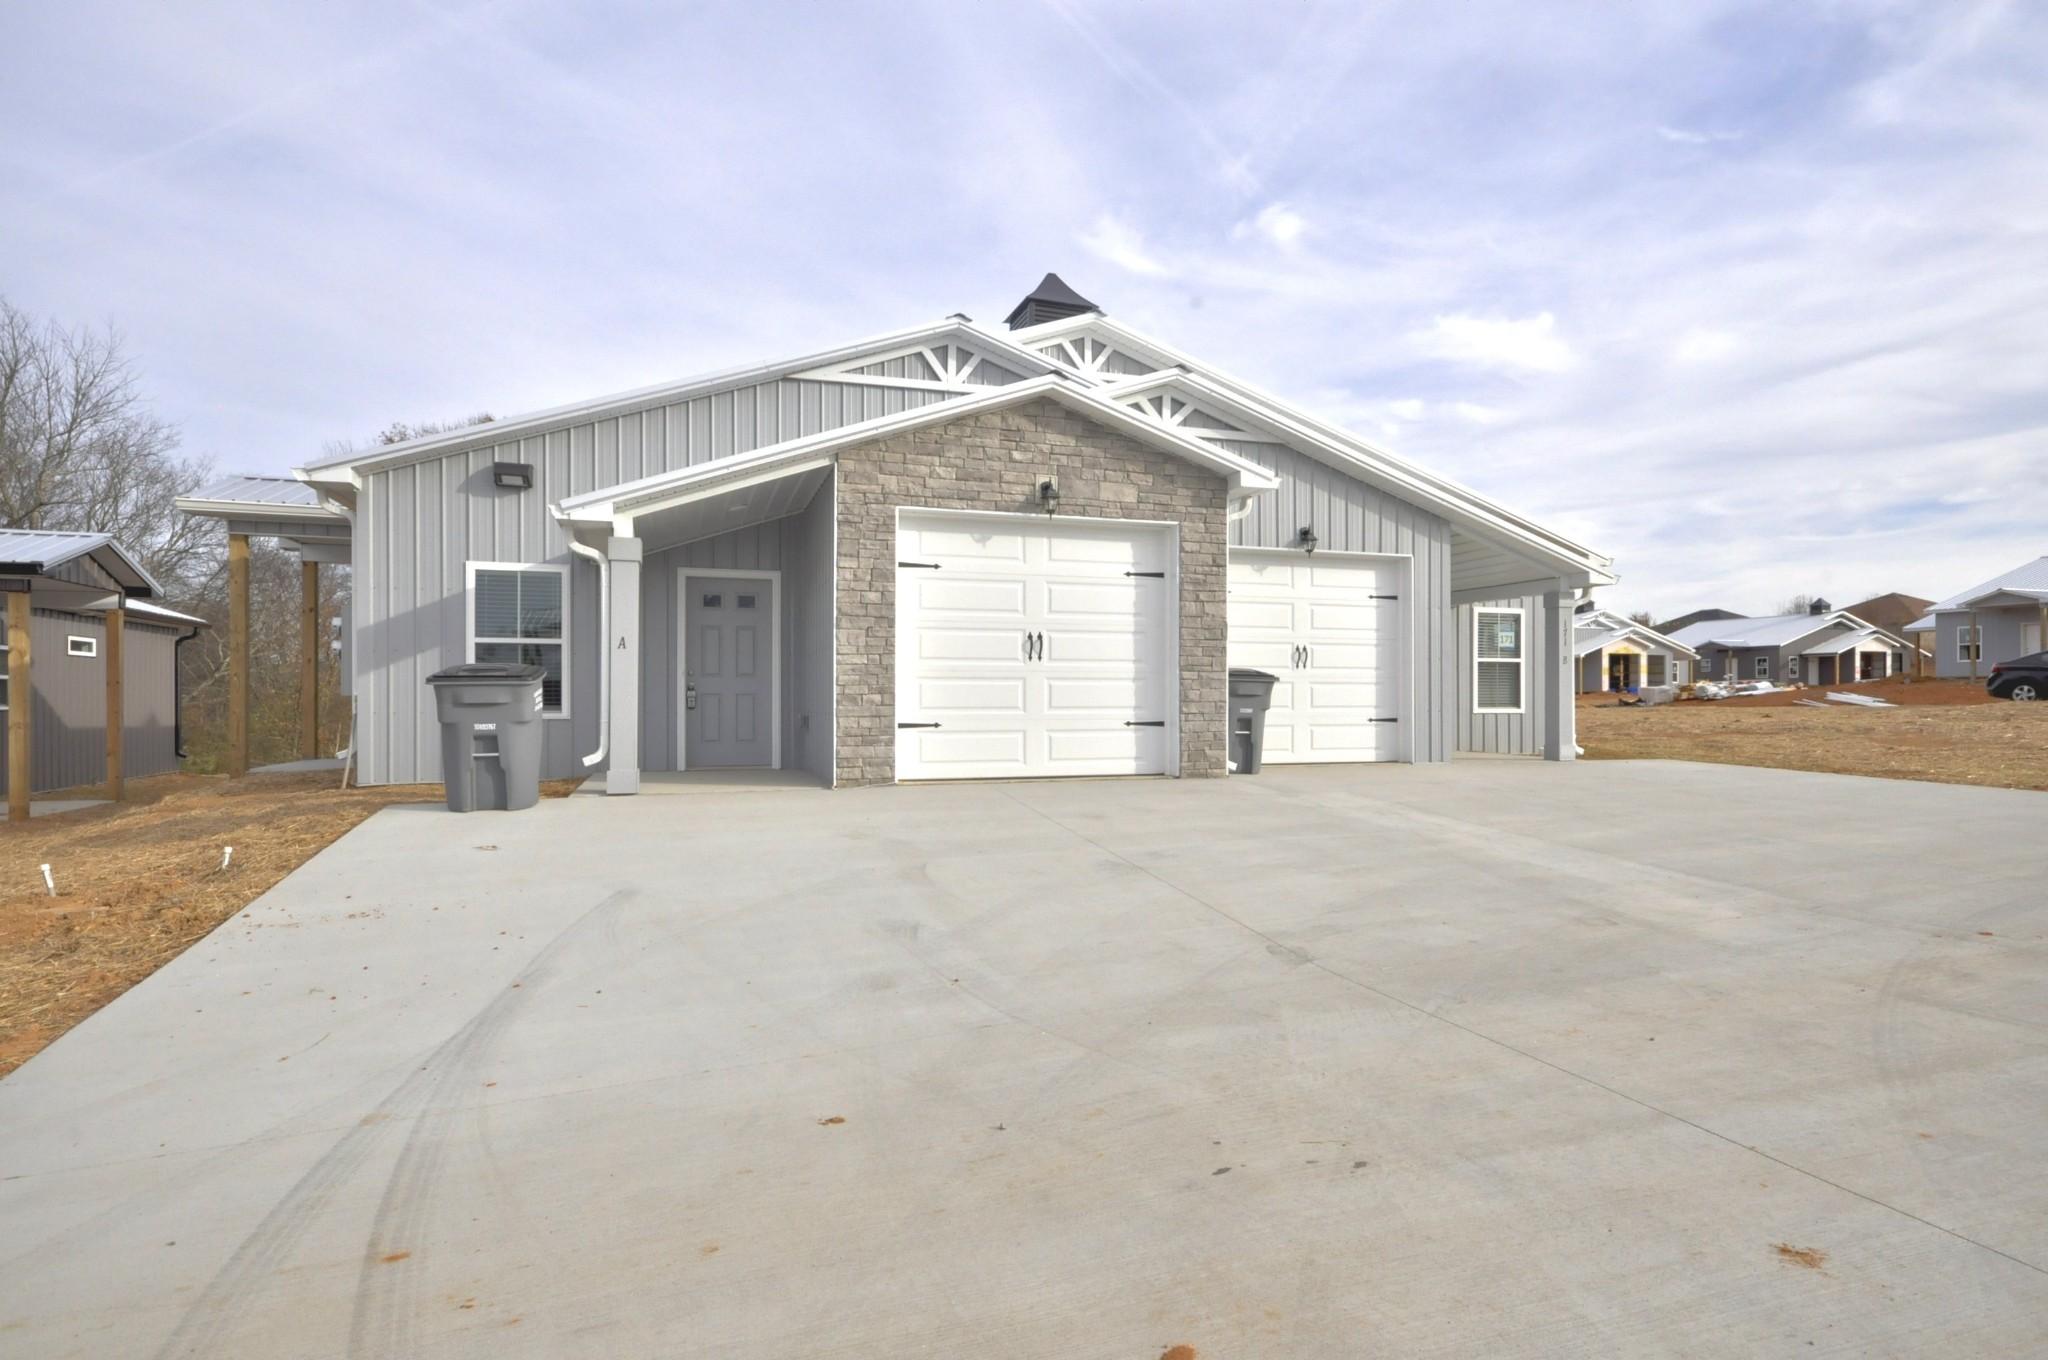 177 BAINBRIDGE DRIVE Unit A #A Property Photo - Clarksville, TN real estate listing